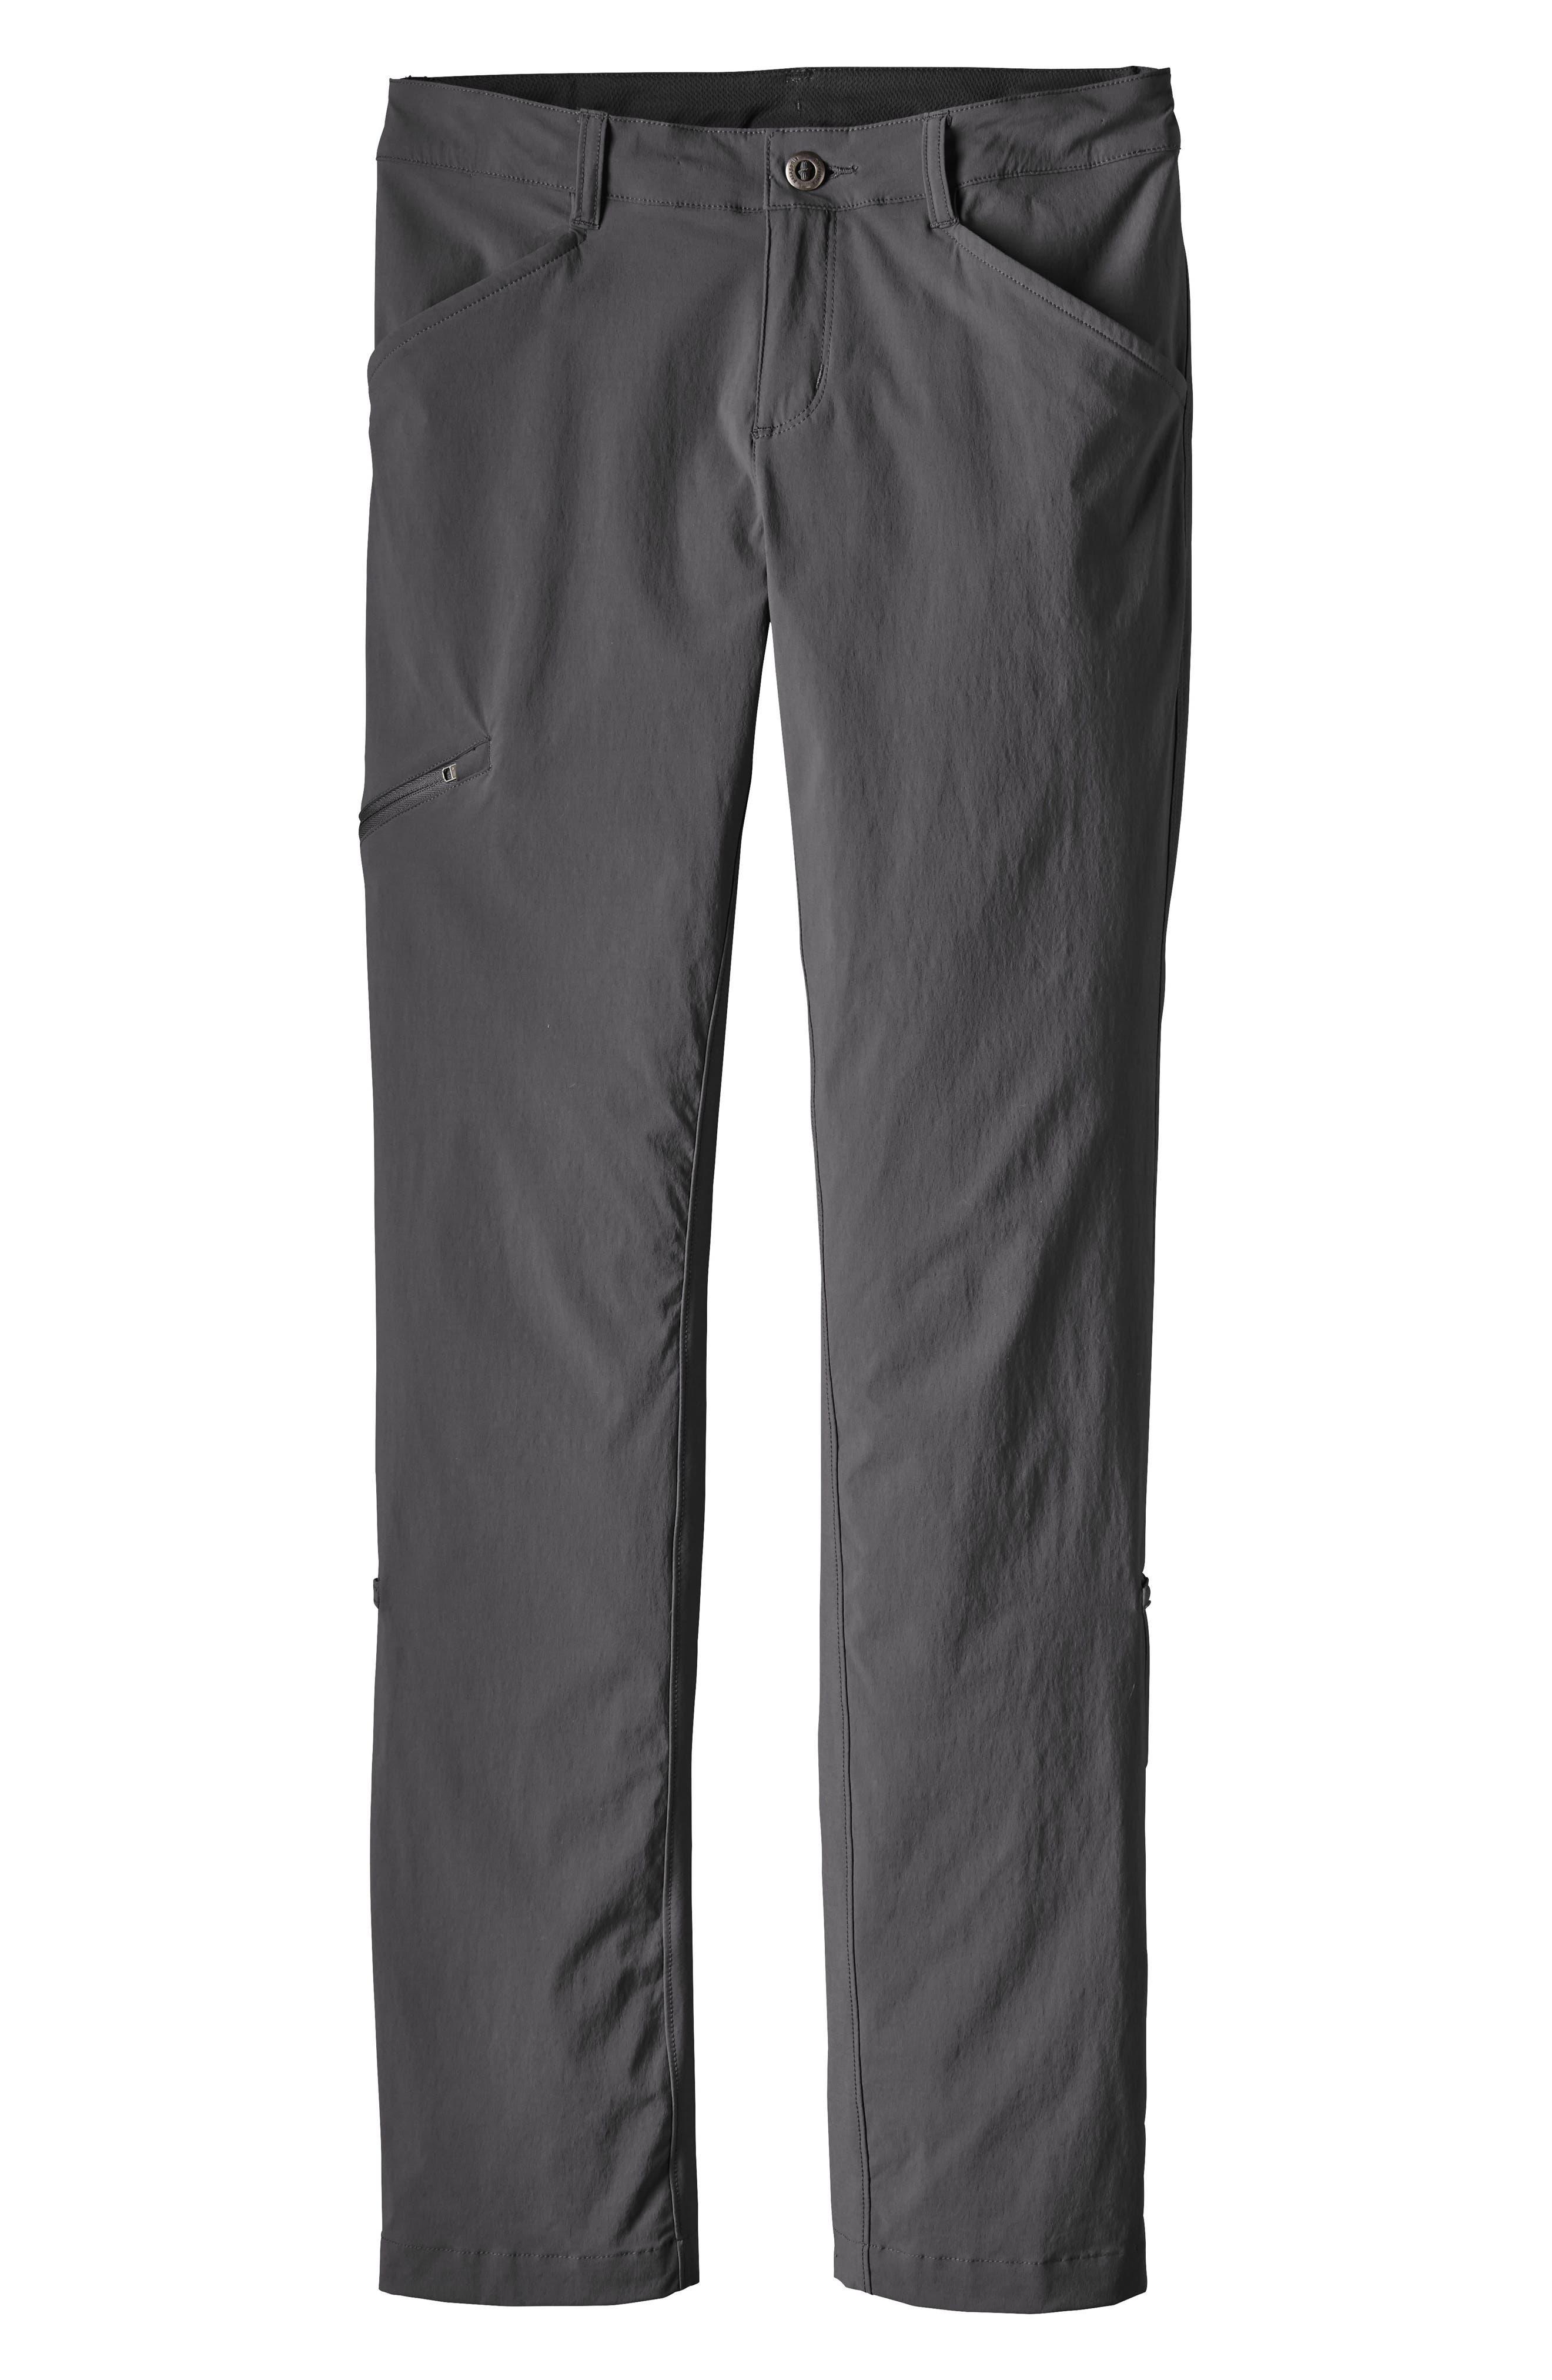 Women's Patagonia Quandary Convertible Pants